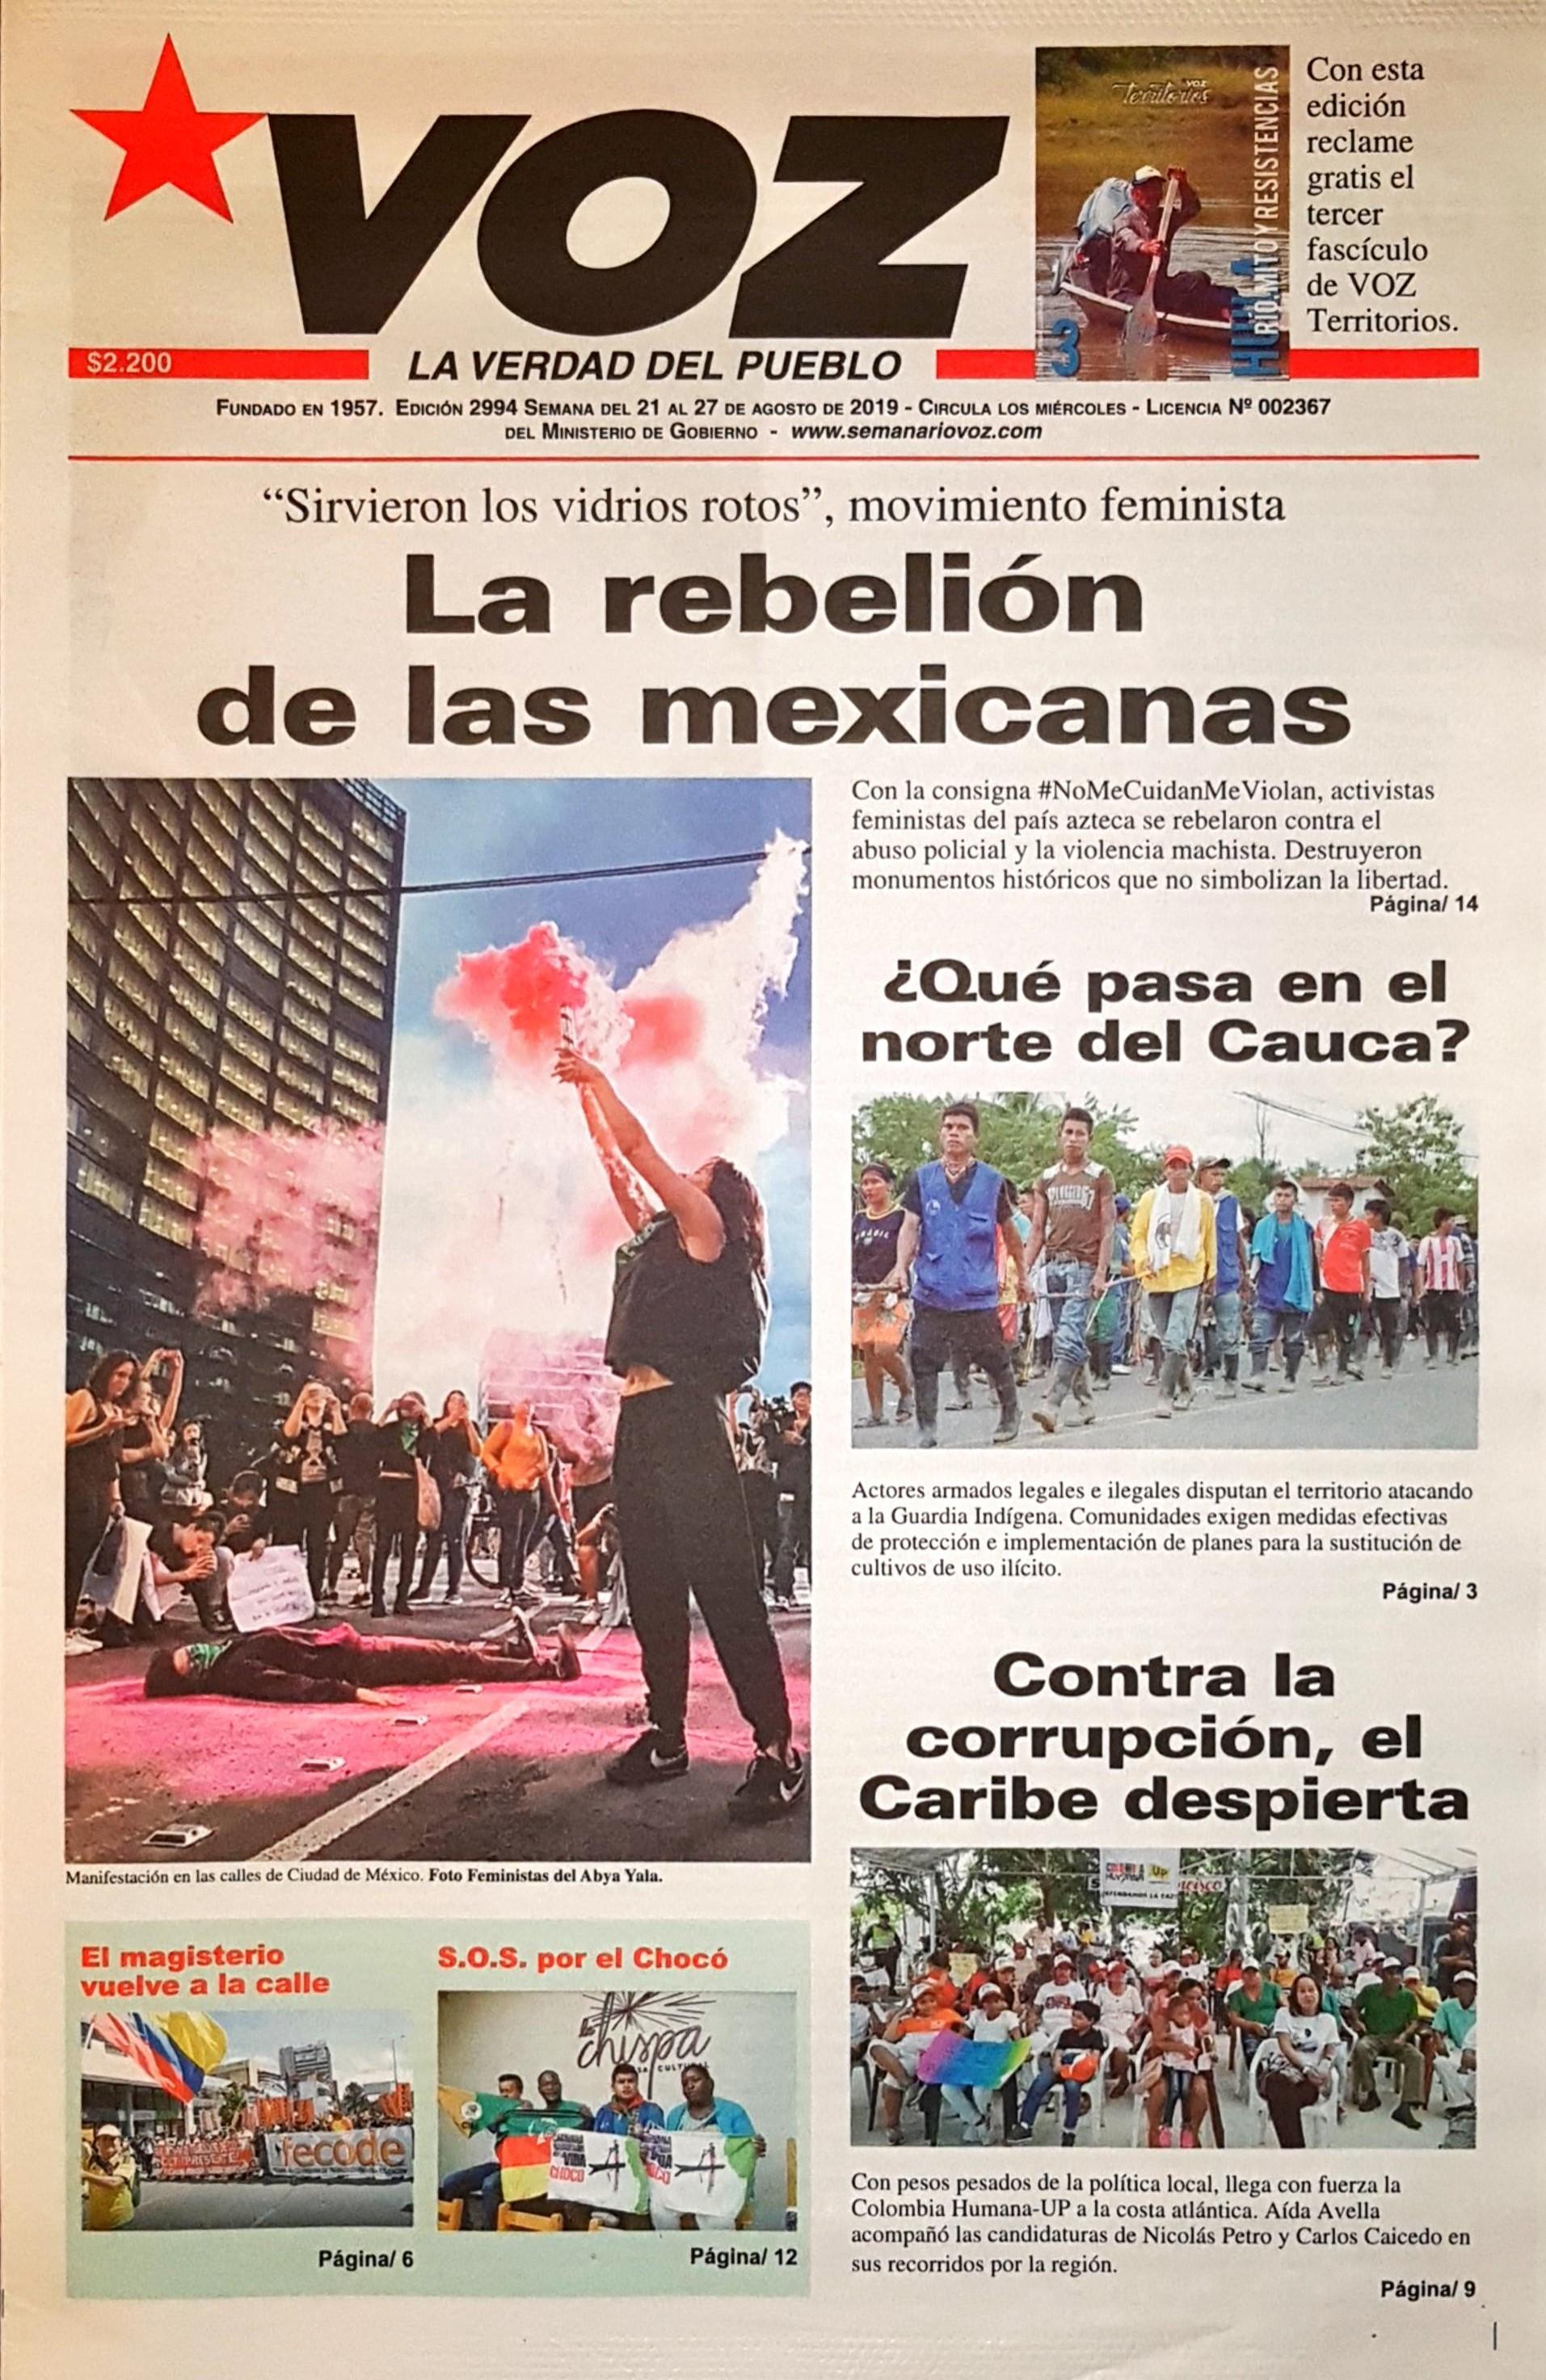 Voz_Colombia